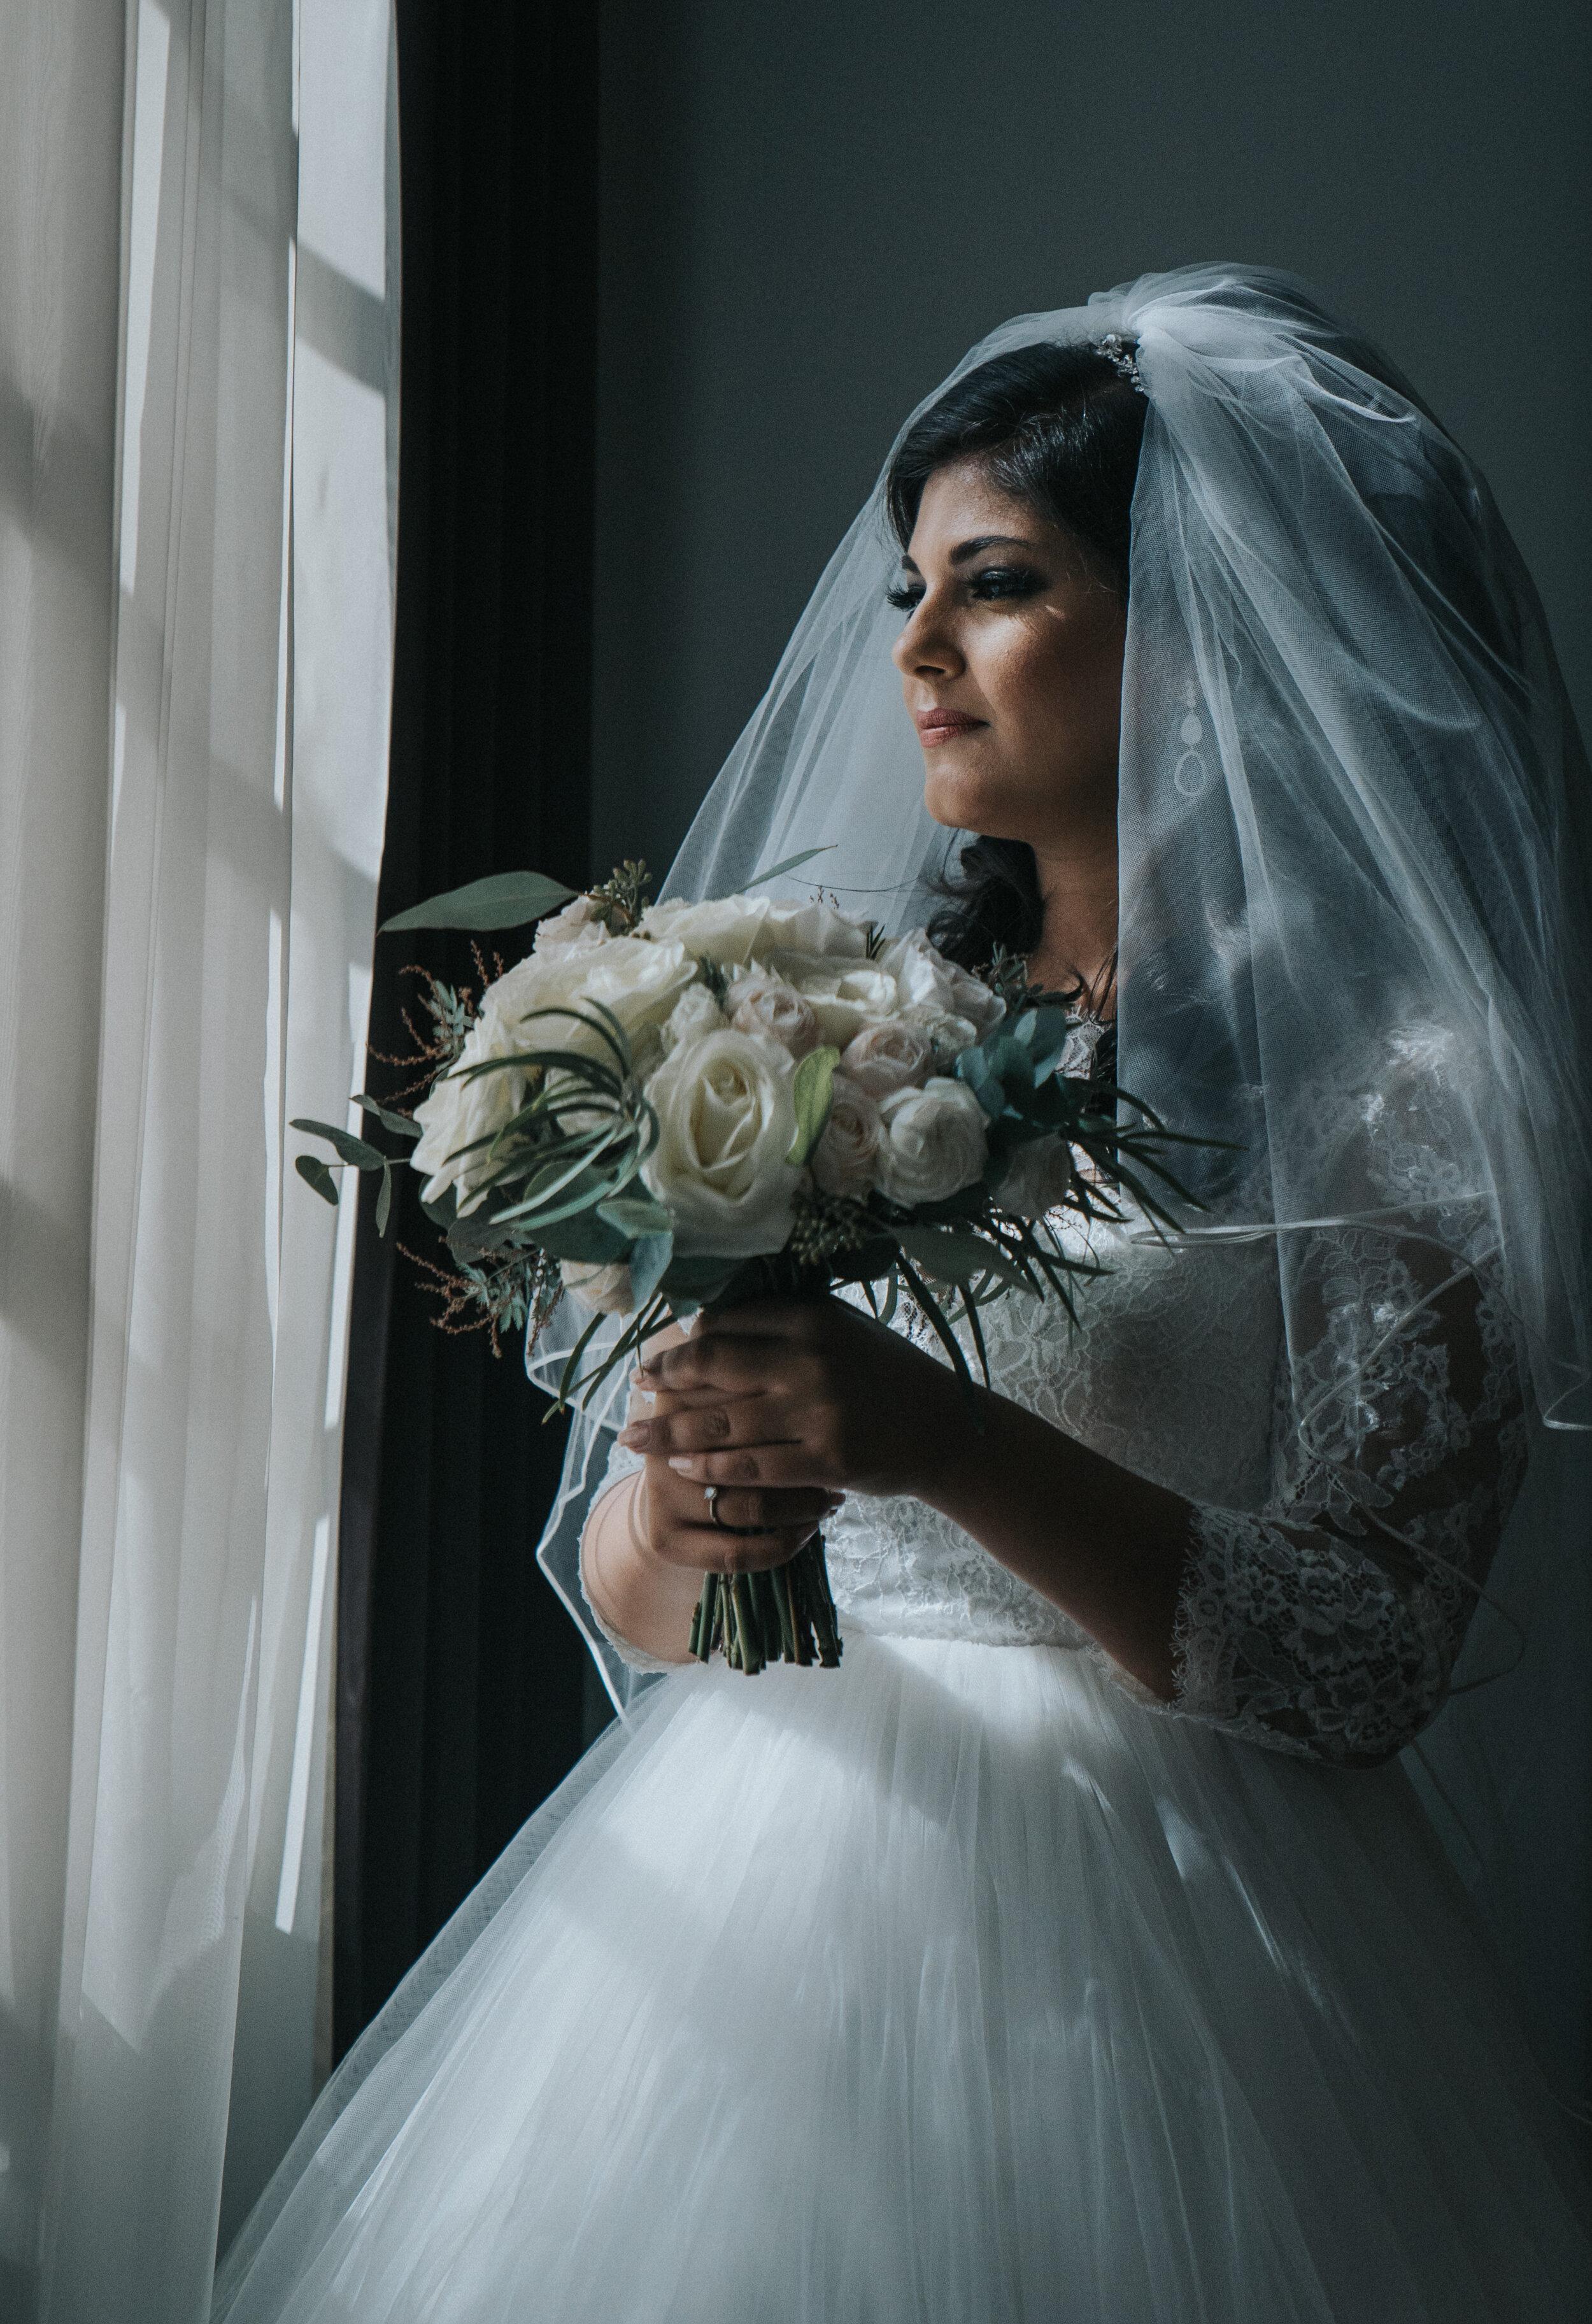 east-london-wedding-photographer-videographer-patriot-square-apartments-25